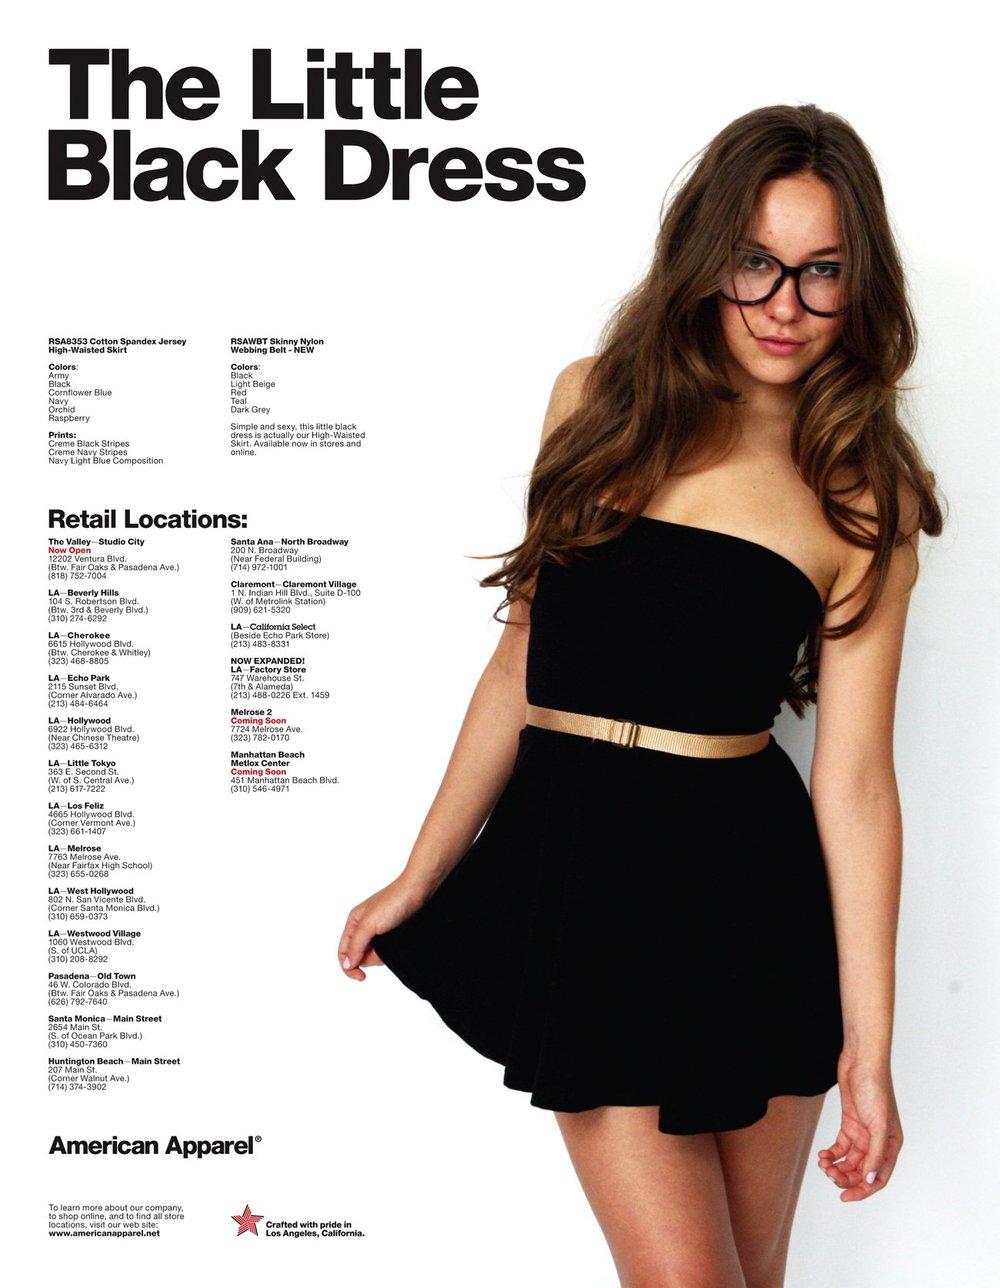 american-apparel-ad-losangeles-littleblackdress-090908.jpg